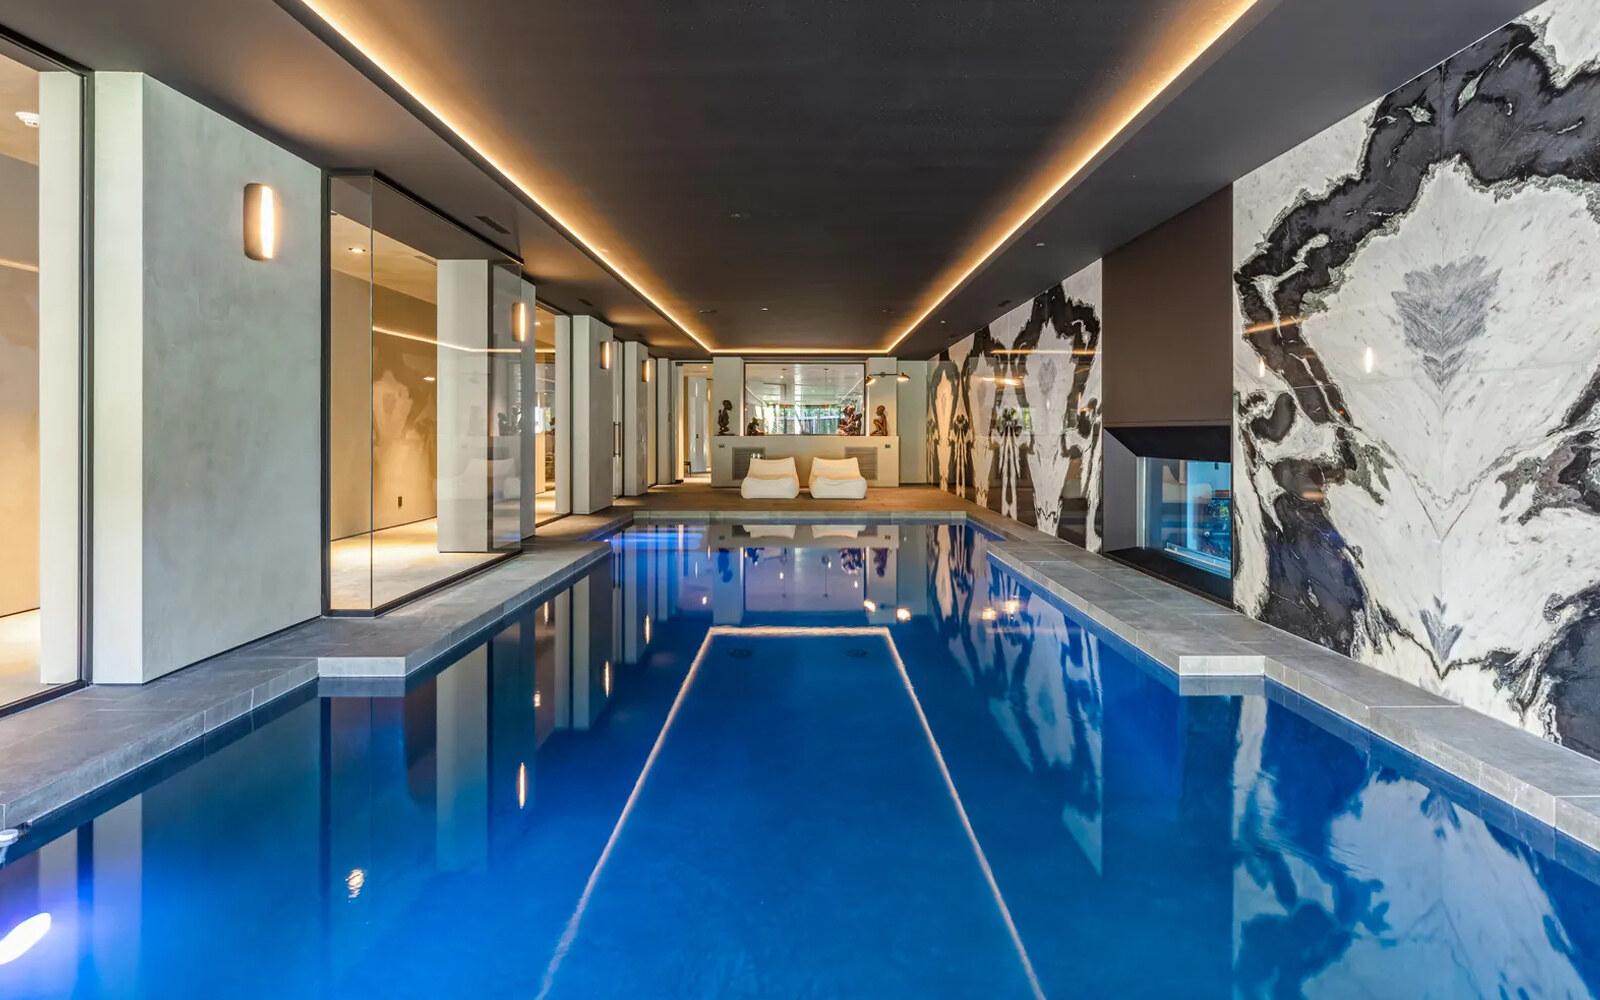 The Weeknd Nuova casa Bel Air